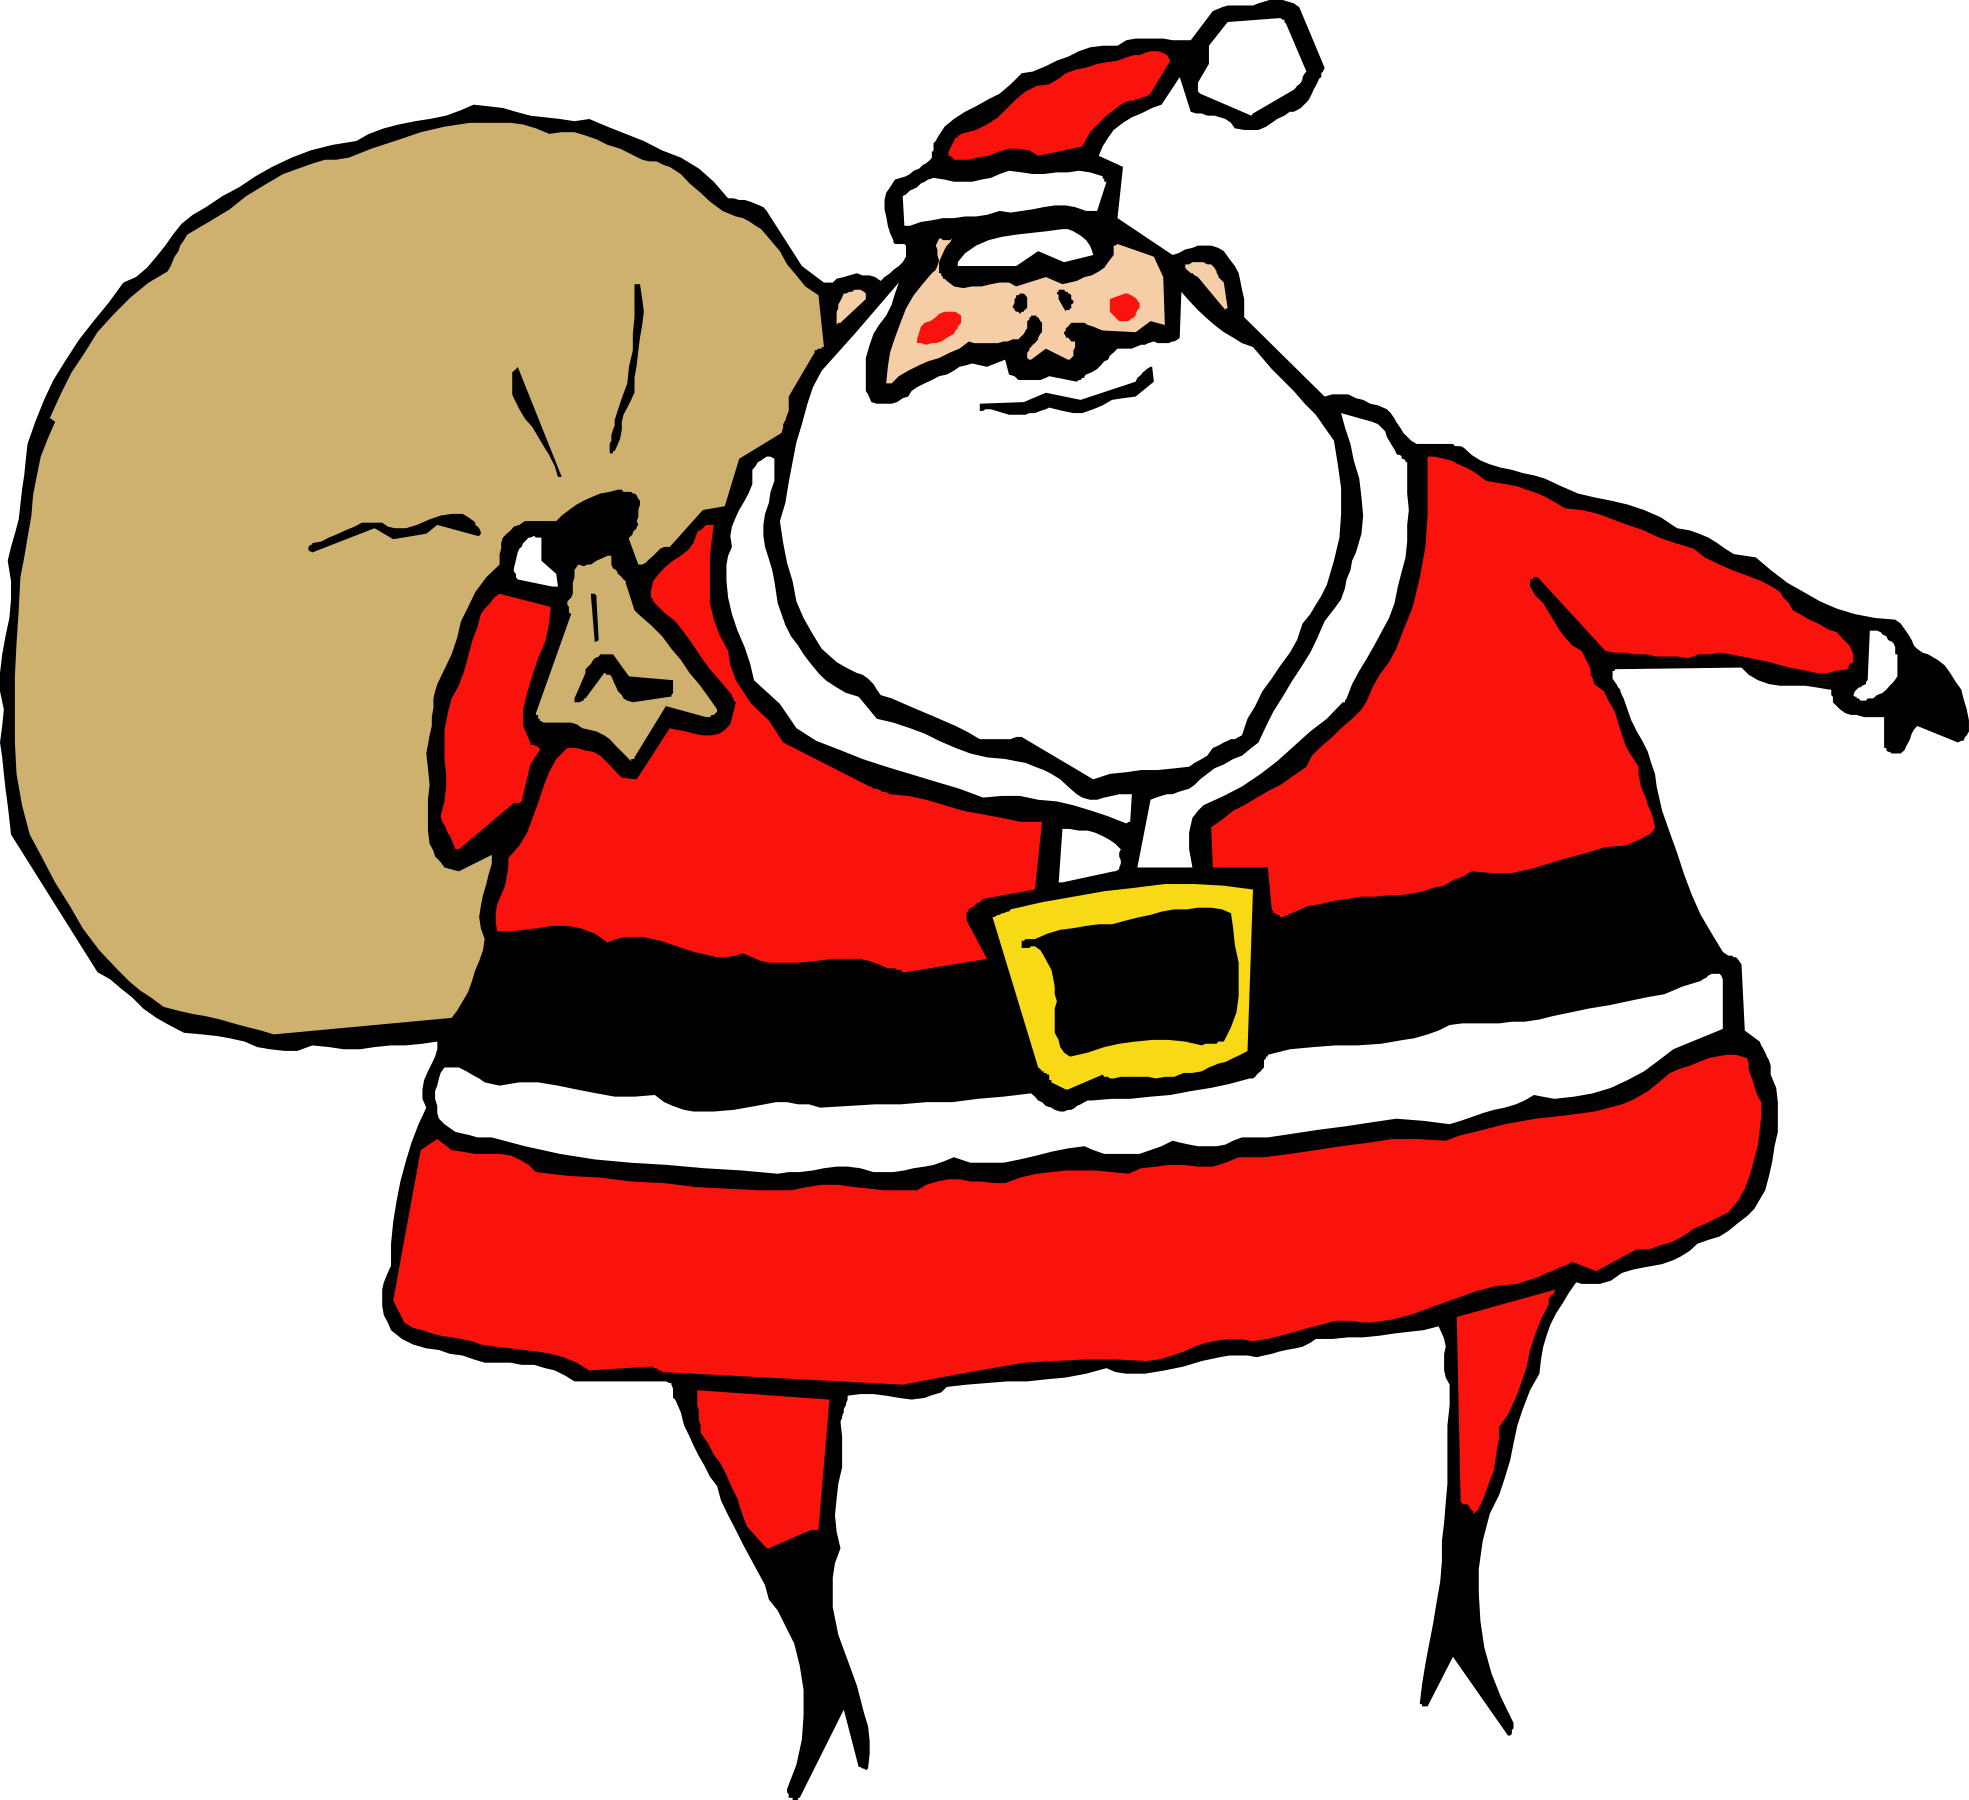 Clipart Of Santa Claus - Cliparts.co